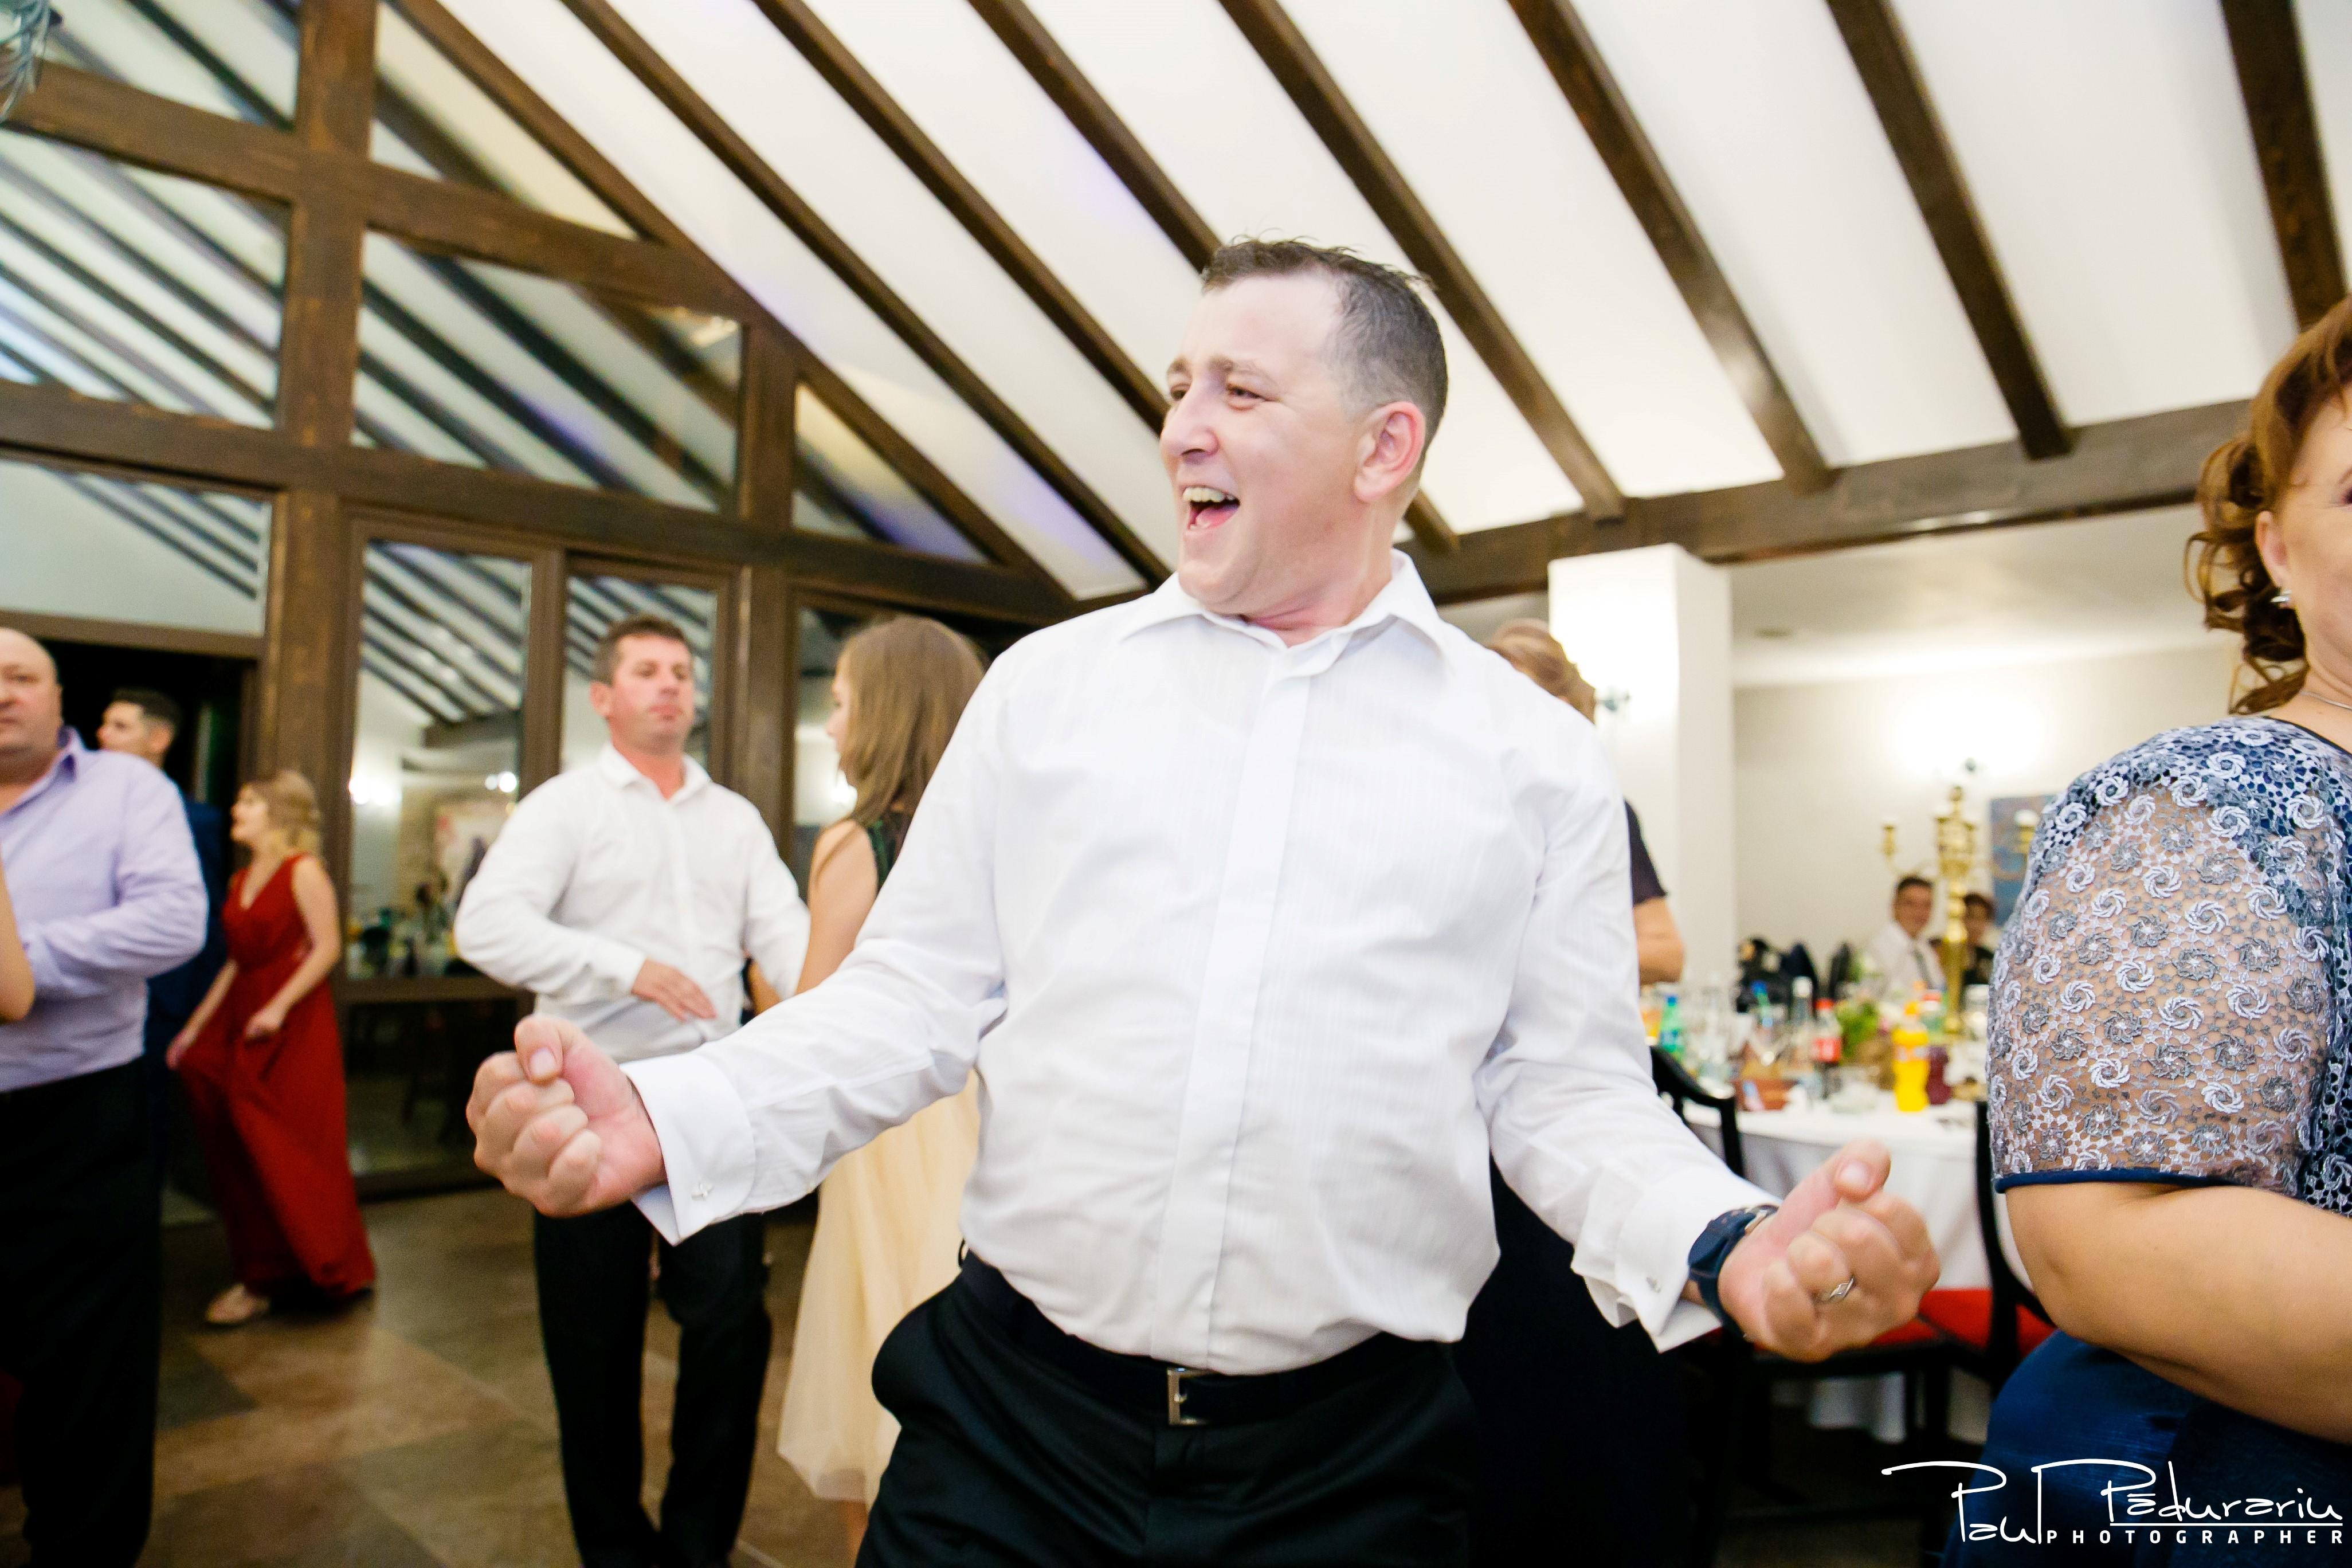 Cristina si Razvan nunta rustica la Bellaria Loja Domneasca petrecere nunta moment dans invitat fotograf profesionist nunta Iasi www.paulpadurariu.ro © 2017 Paul Padurariu